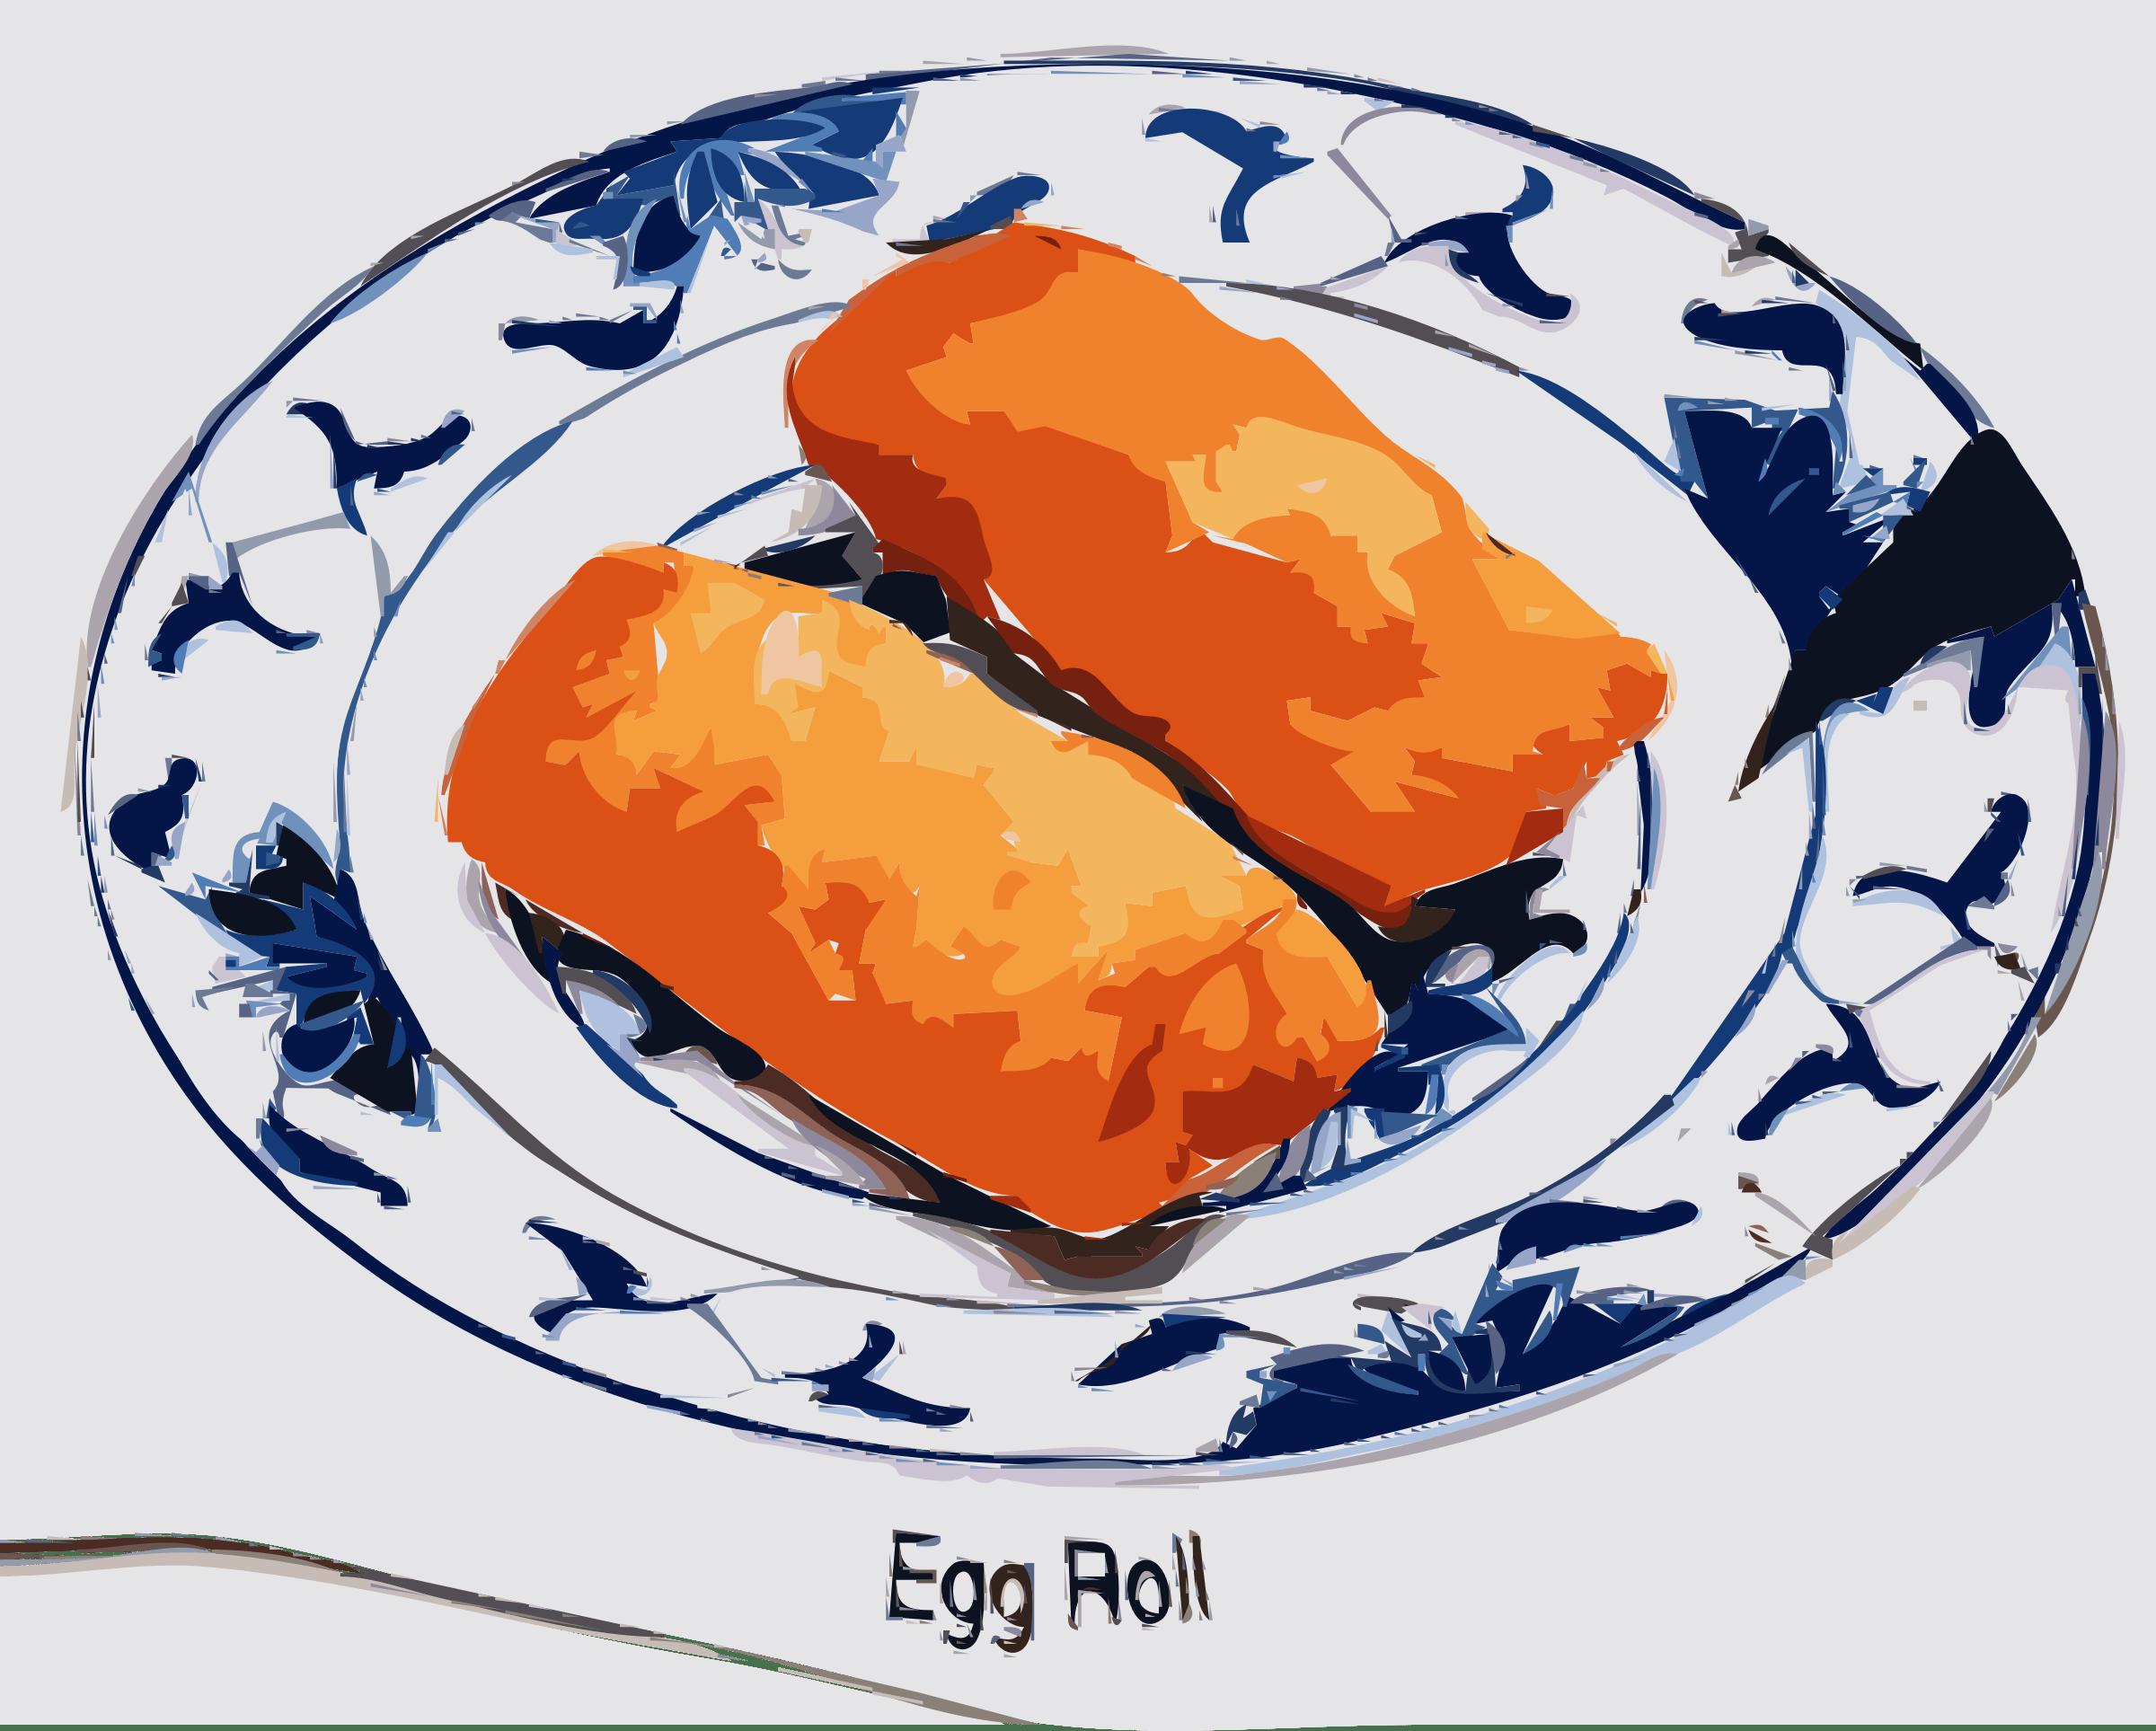 Egg roll clipart » Clipart Portal.